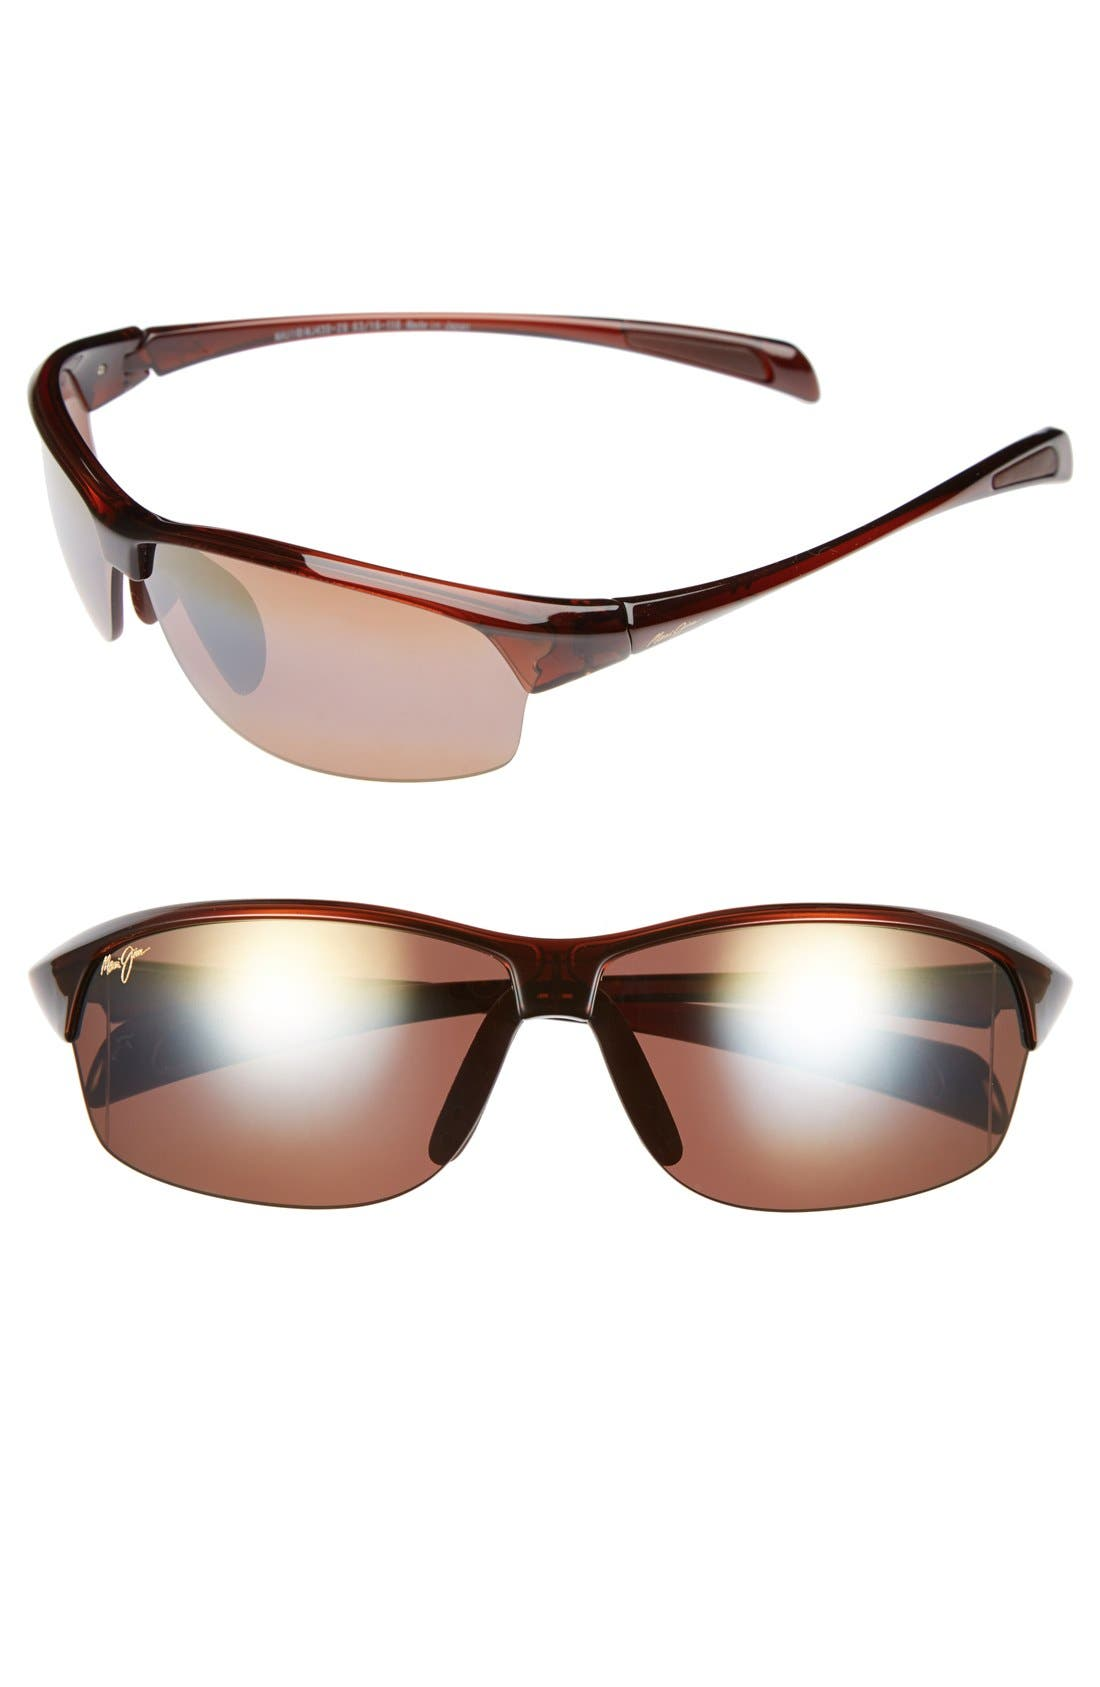 Main Image - Maui Jim River Jetty 63mm PolarizedPlus2® Sunglasses